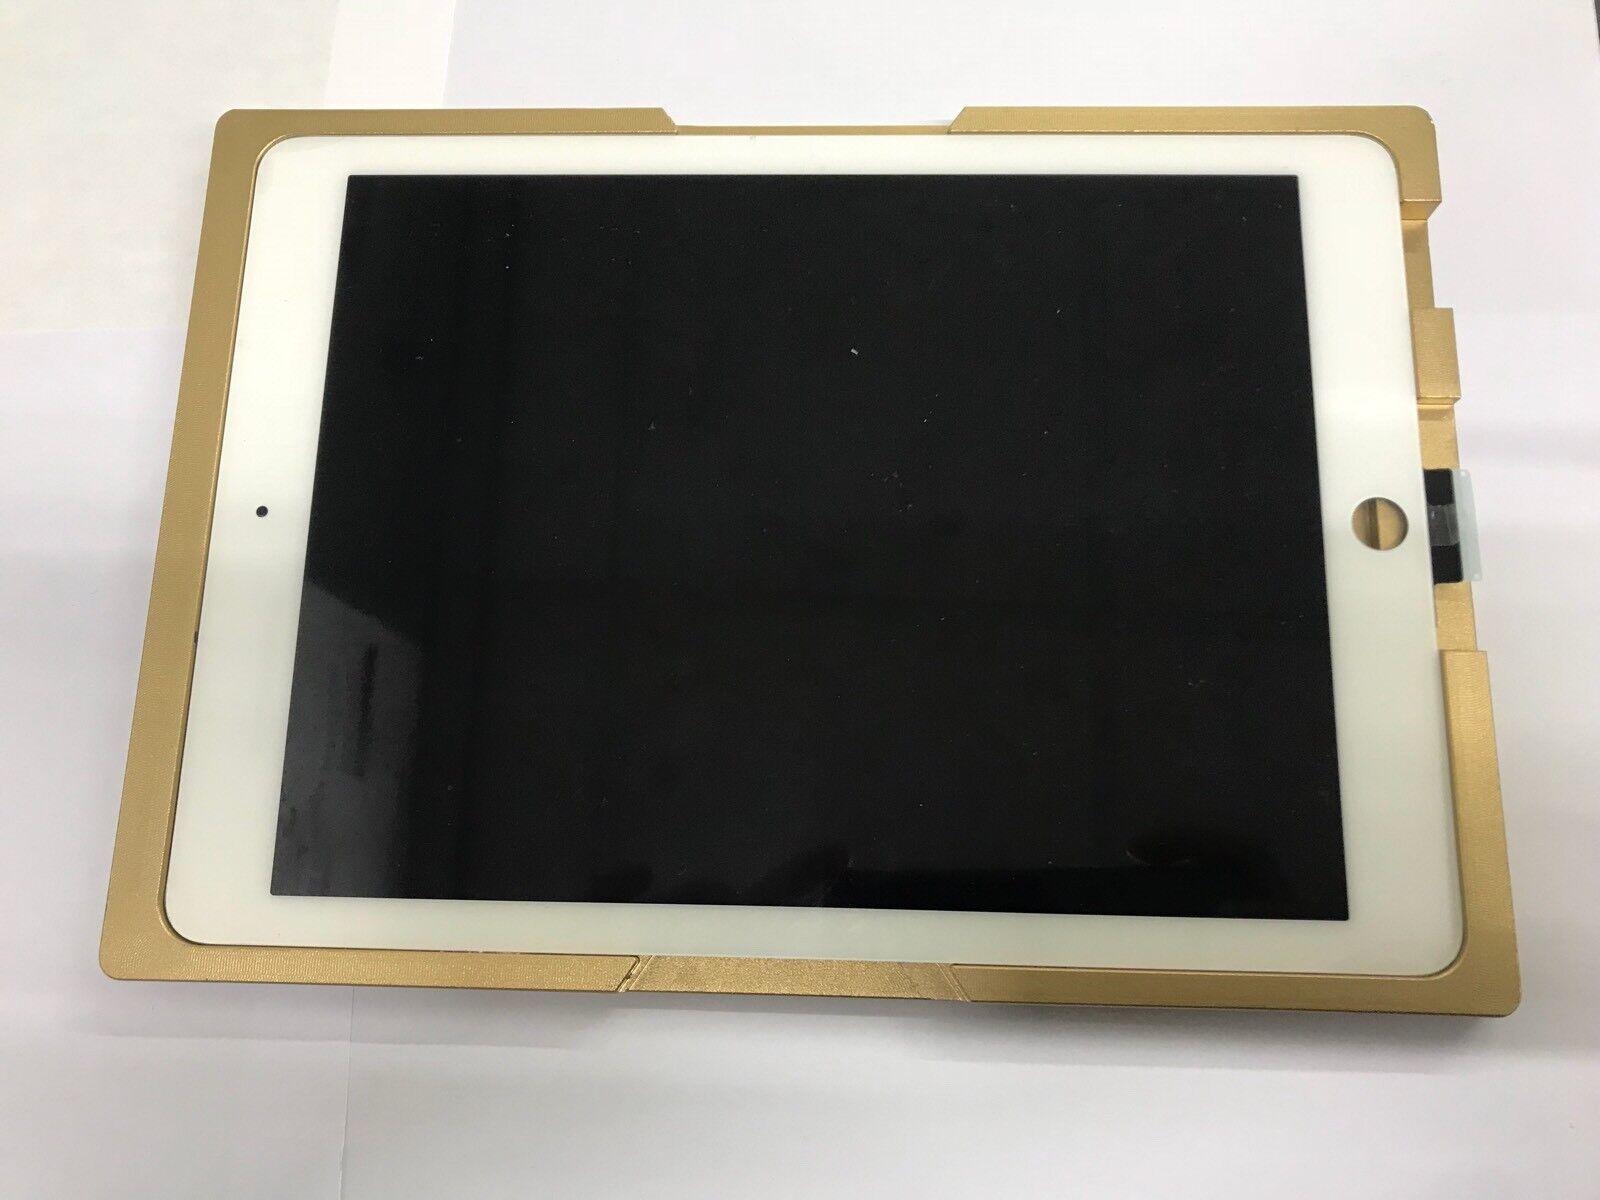 Купить Apple iPad Air 2 LCD Digitizer Glass Screen Replacement Repair Service Fast!!!